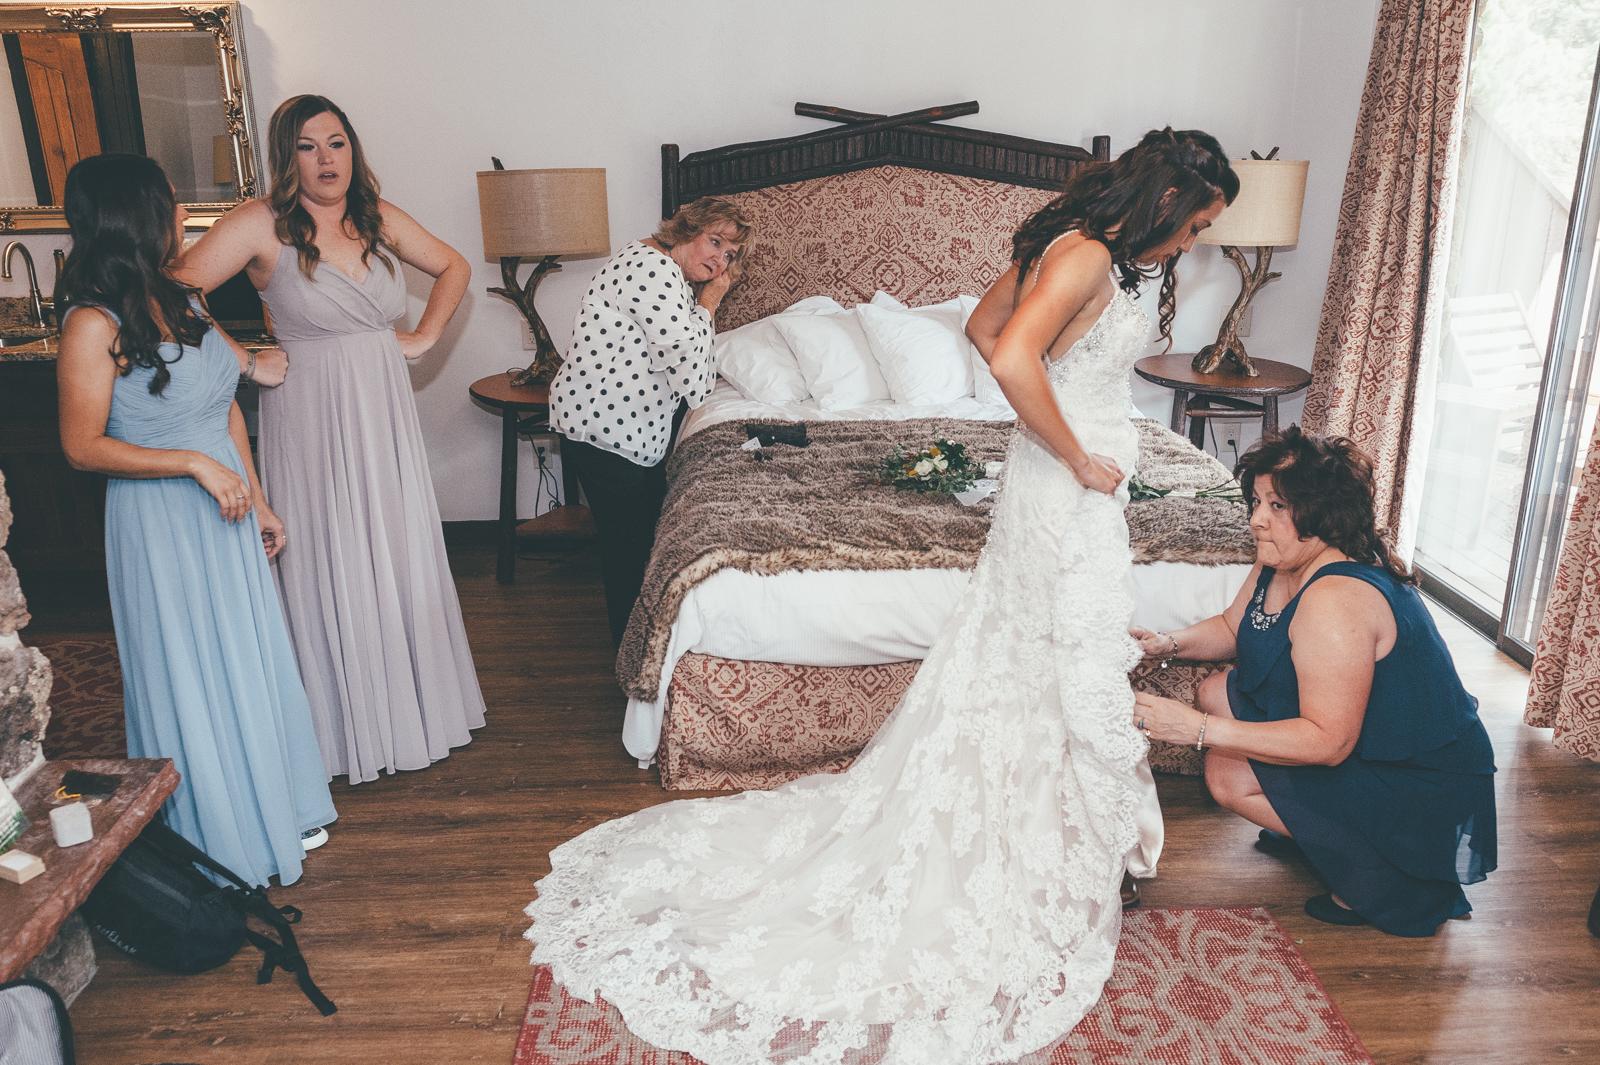 ChadFahnestockPhotography-estes-park-wedding-photography-014.jpg